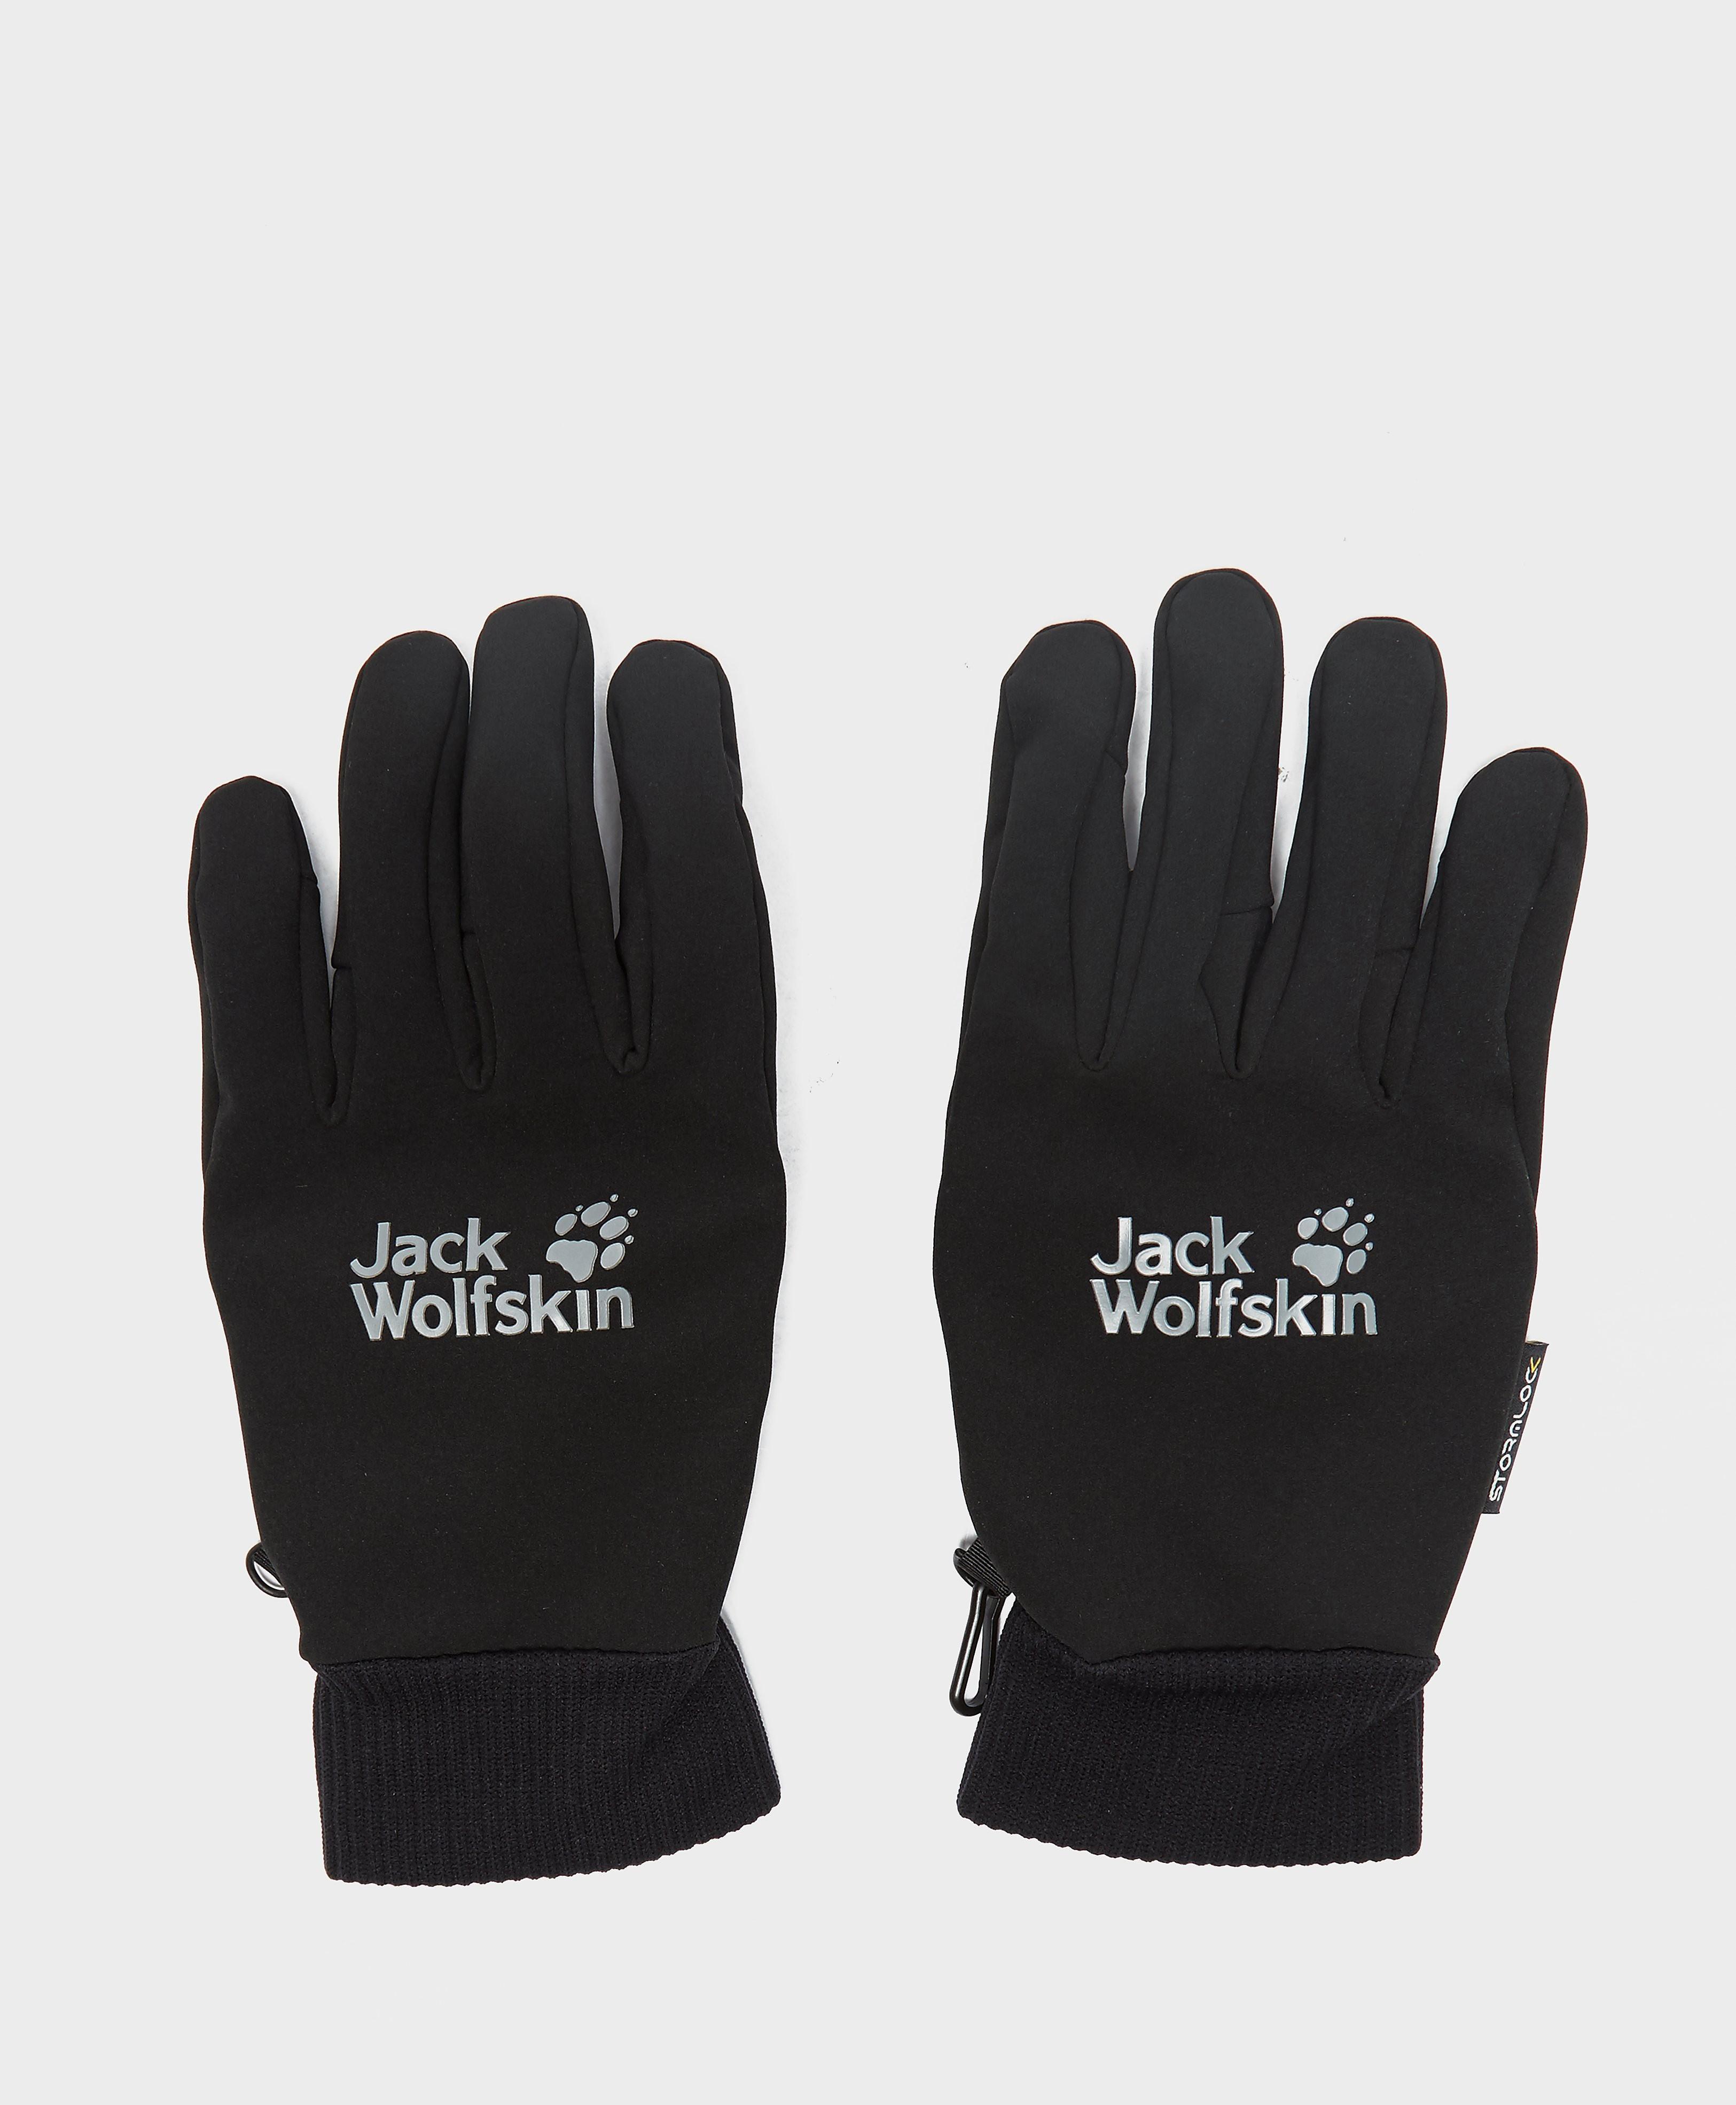 Jack Wolfskin Stormlock Gloves